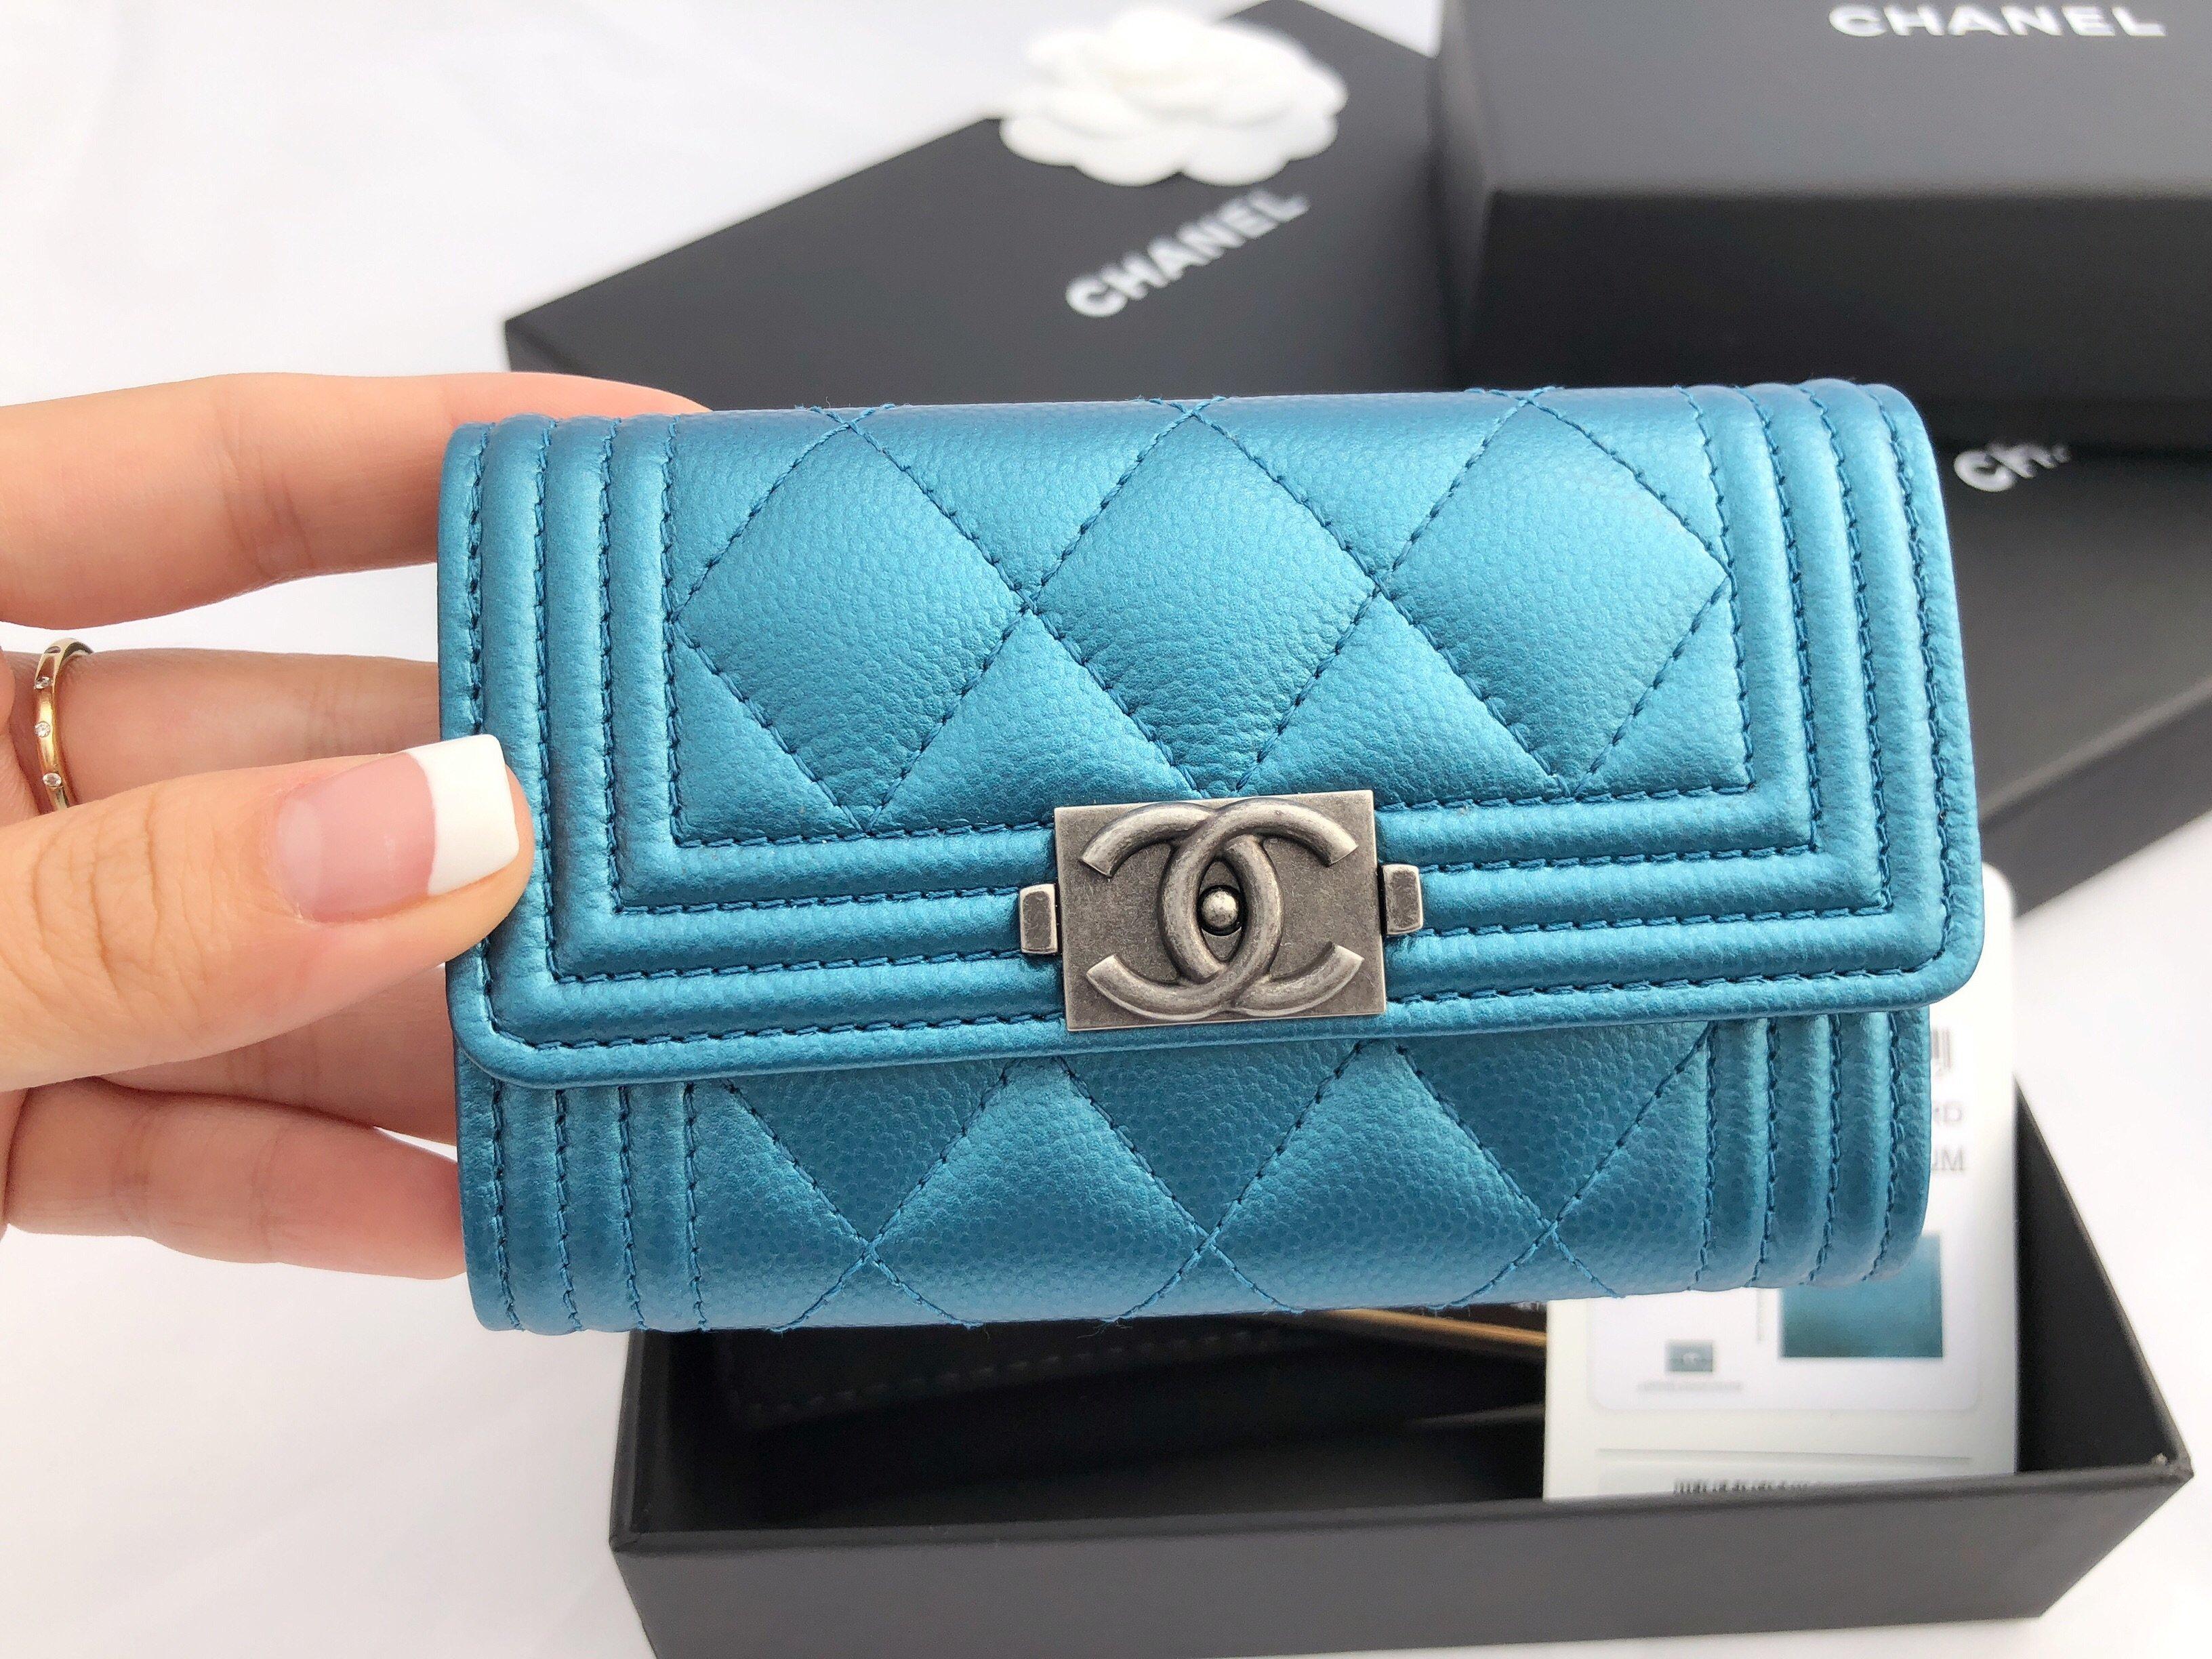 aadf77ff4693 NWT Chanel Boy Caviar Flap Flat O Card Holder O Case Wallet Metallic  Turquoise